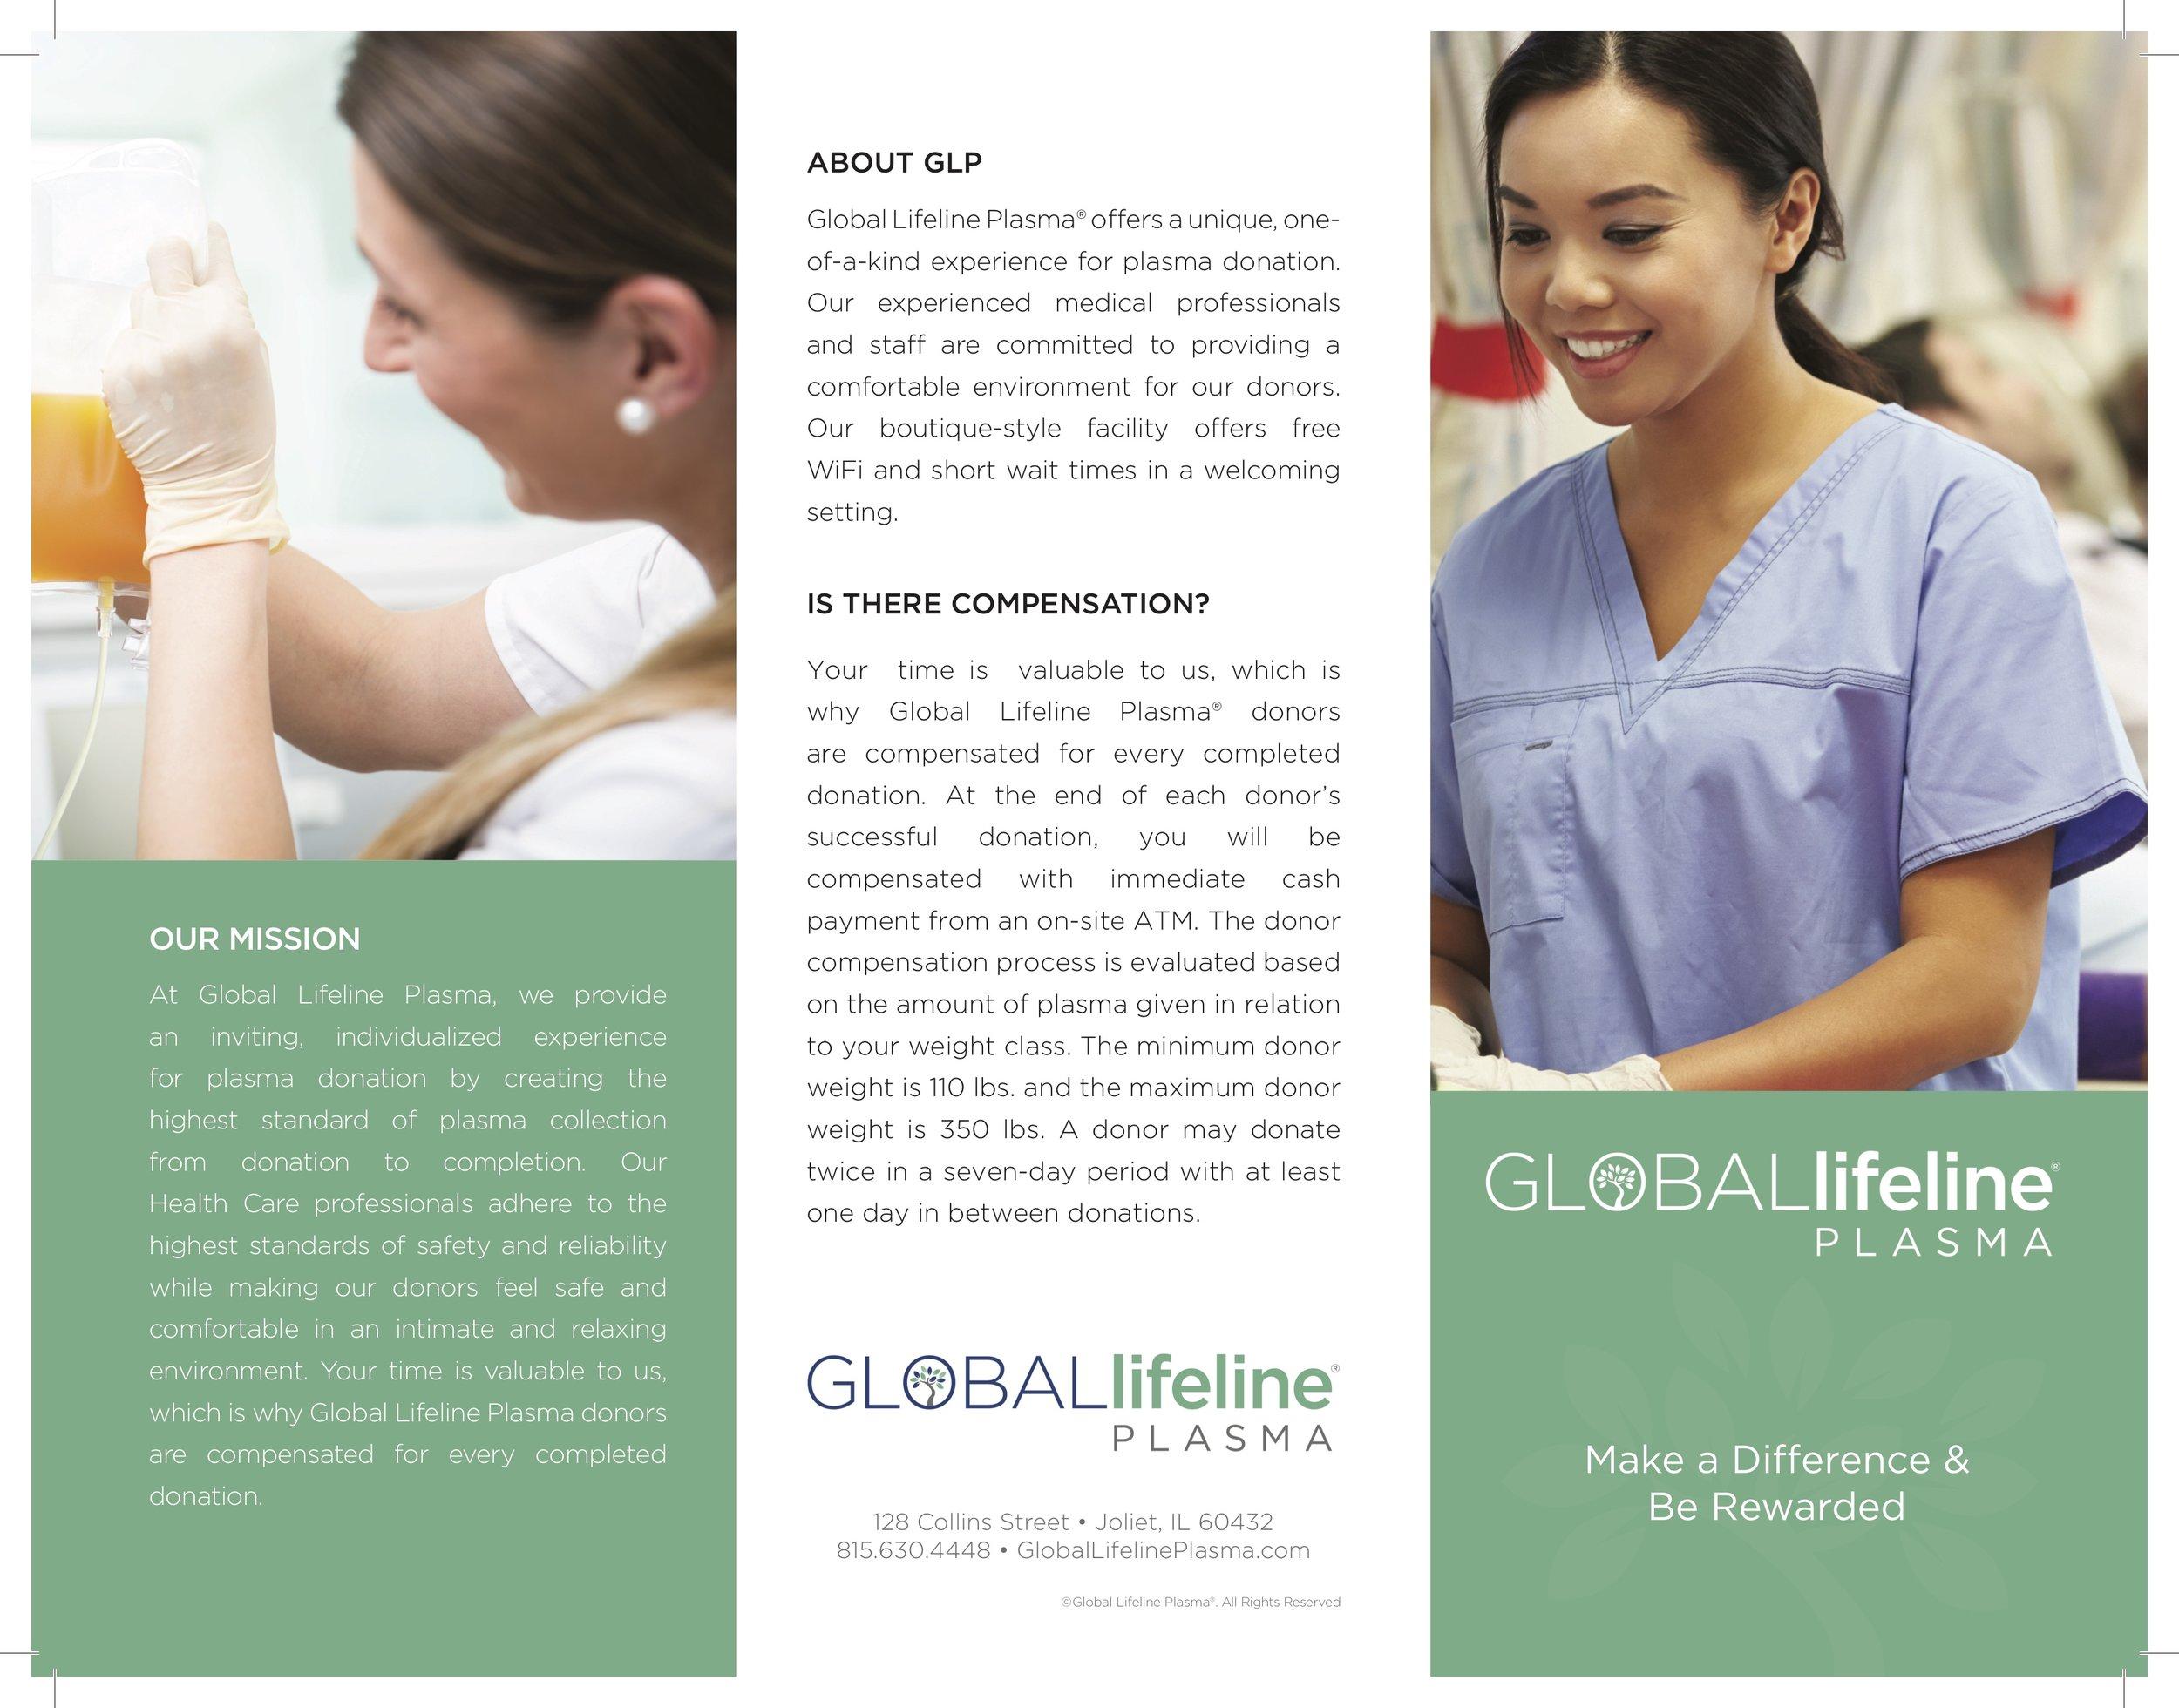 GLP Clinical Brochure_FINAL_1.24.18.jpg